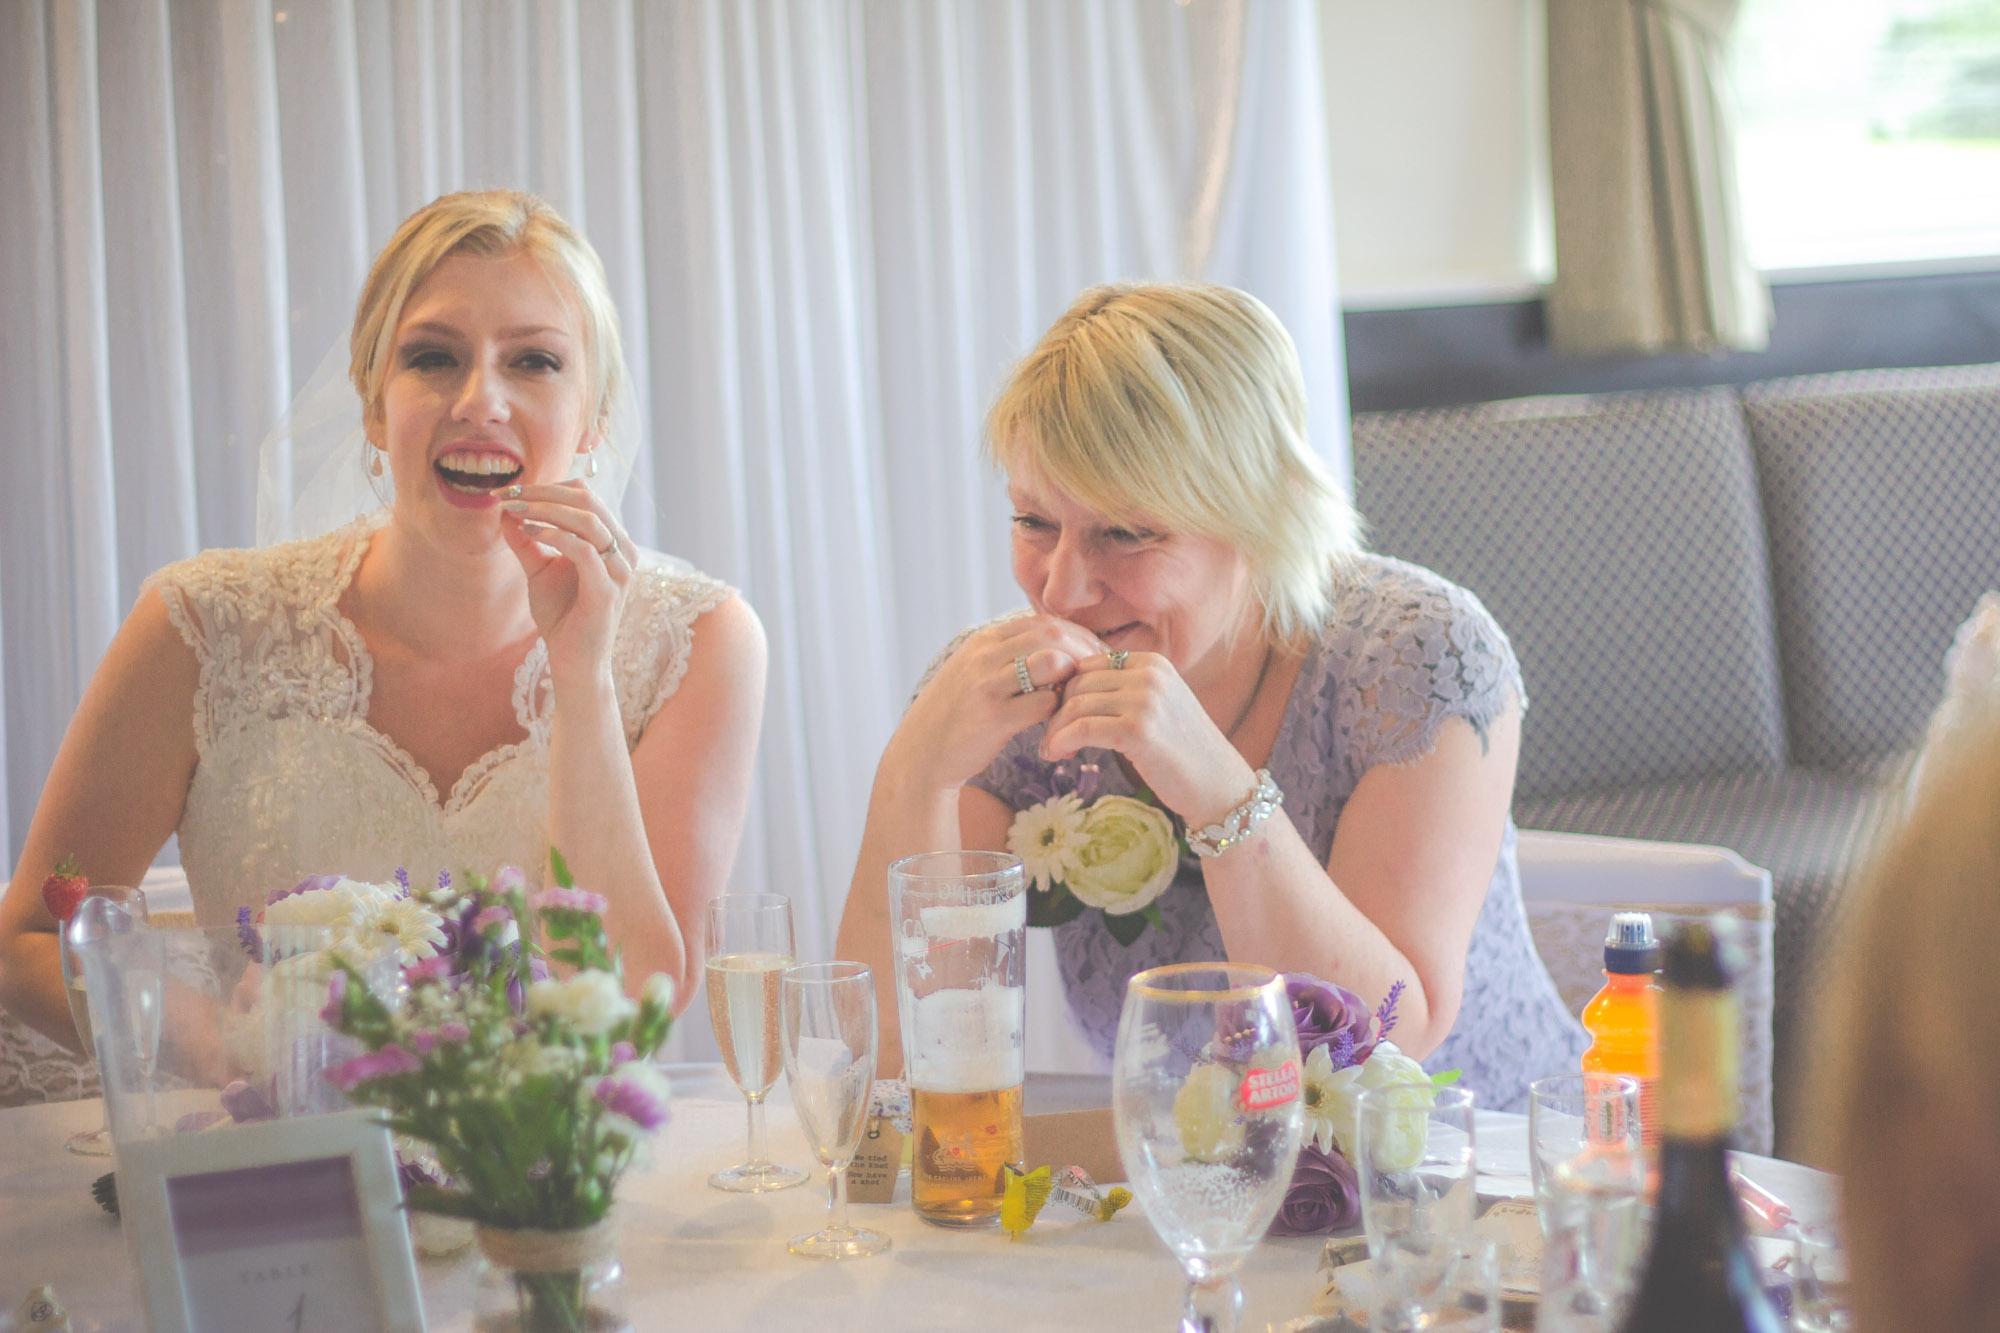 skipton-registry-office-wedding-photography-51.jpg